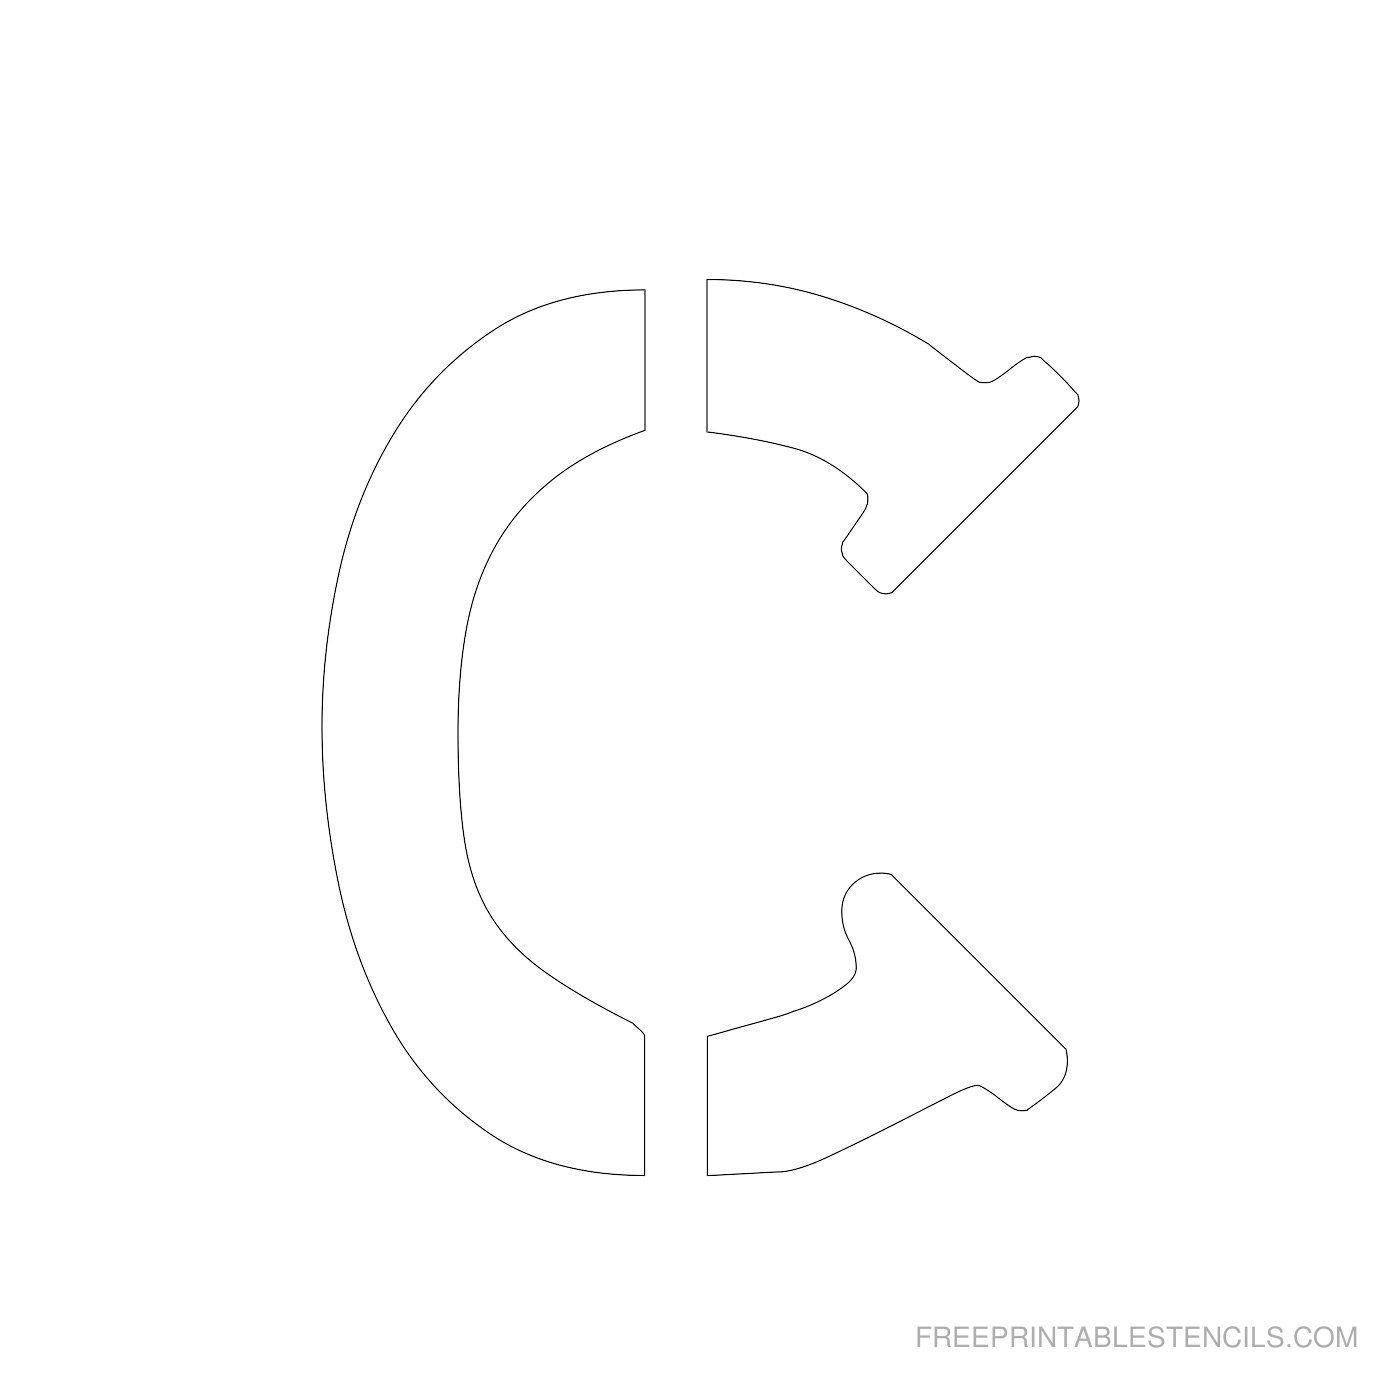 Printable 4 Inch Letter Stencils | Lettering | Letter Stencils To - Free Printable 4 Inch Number Stencils